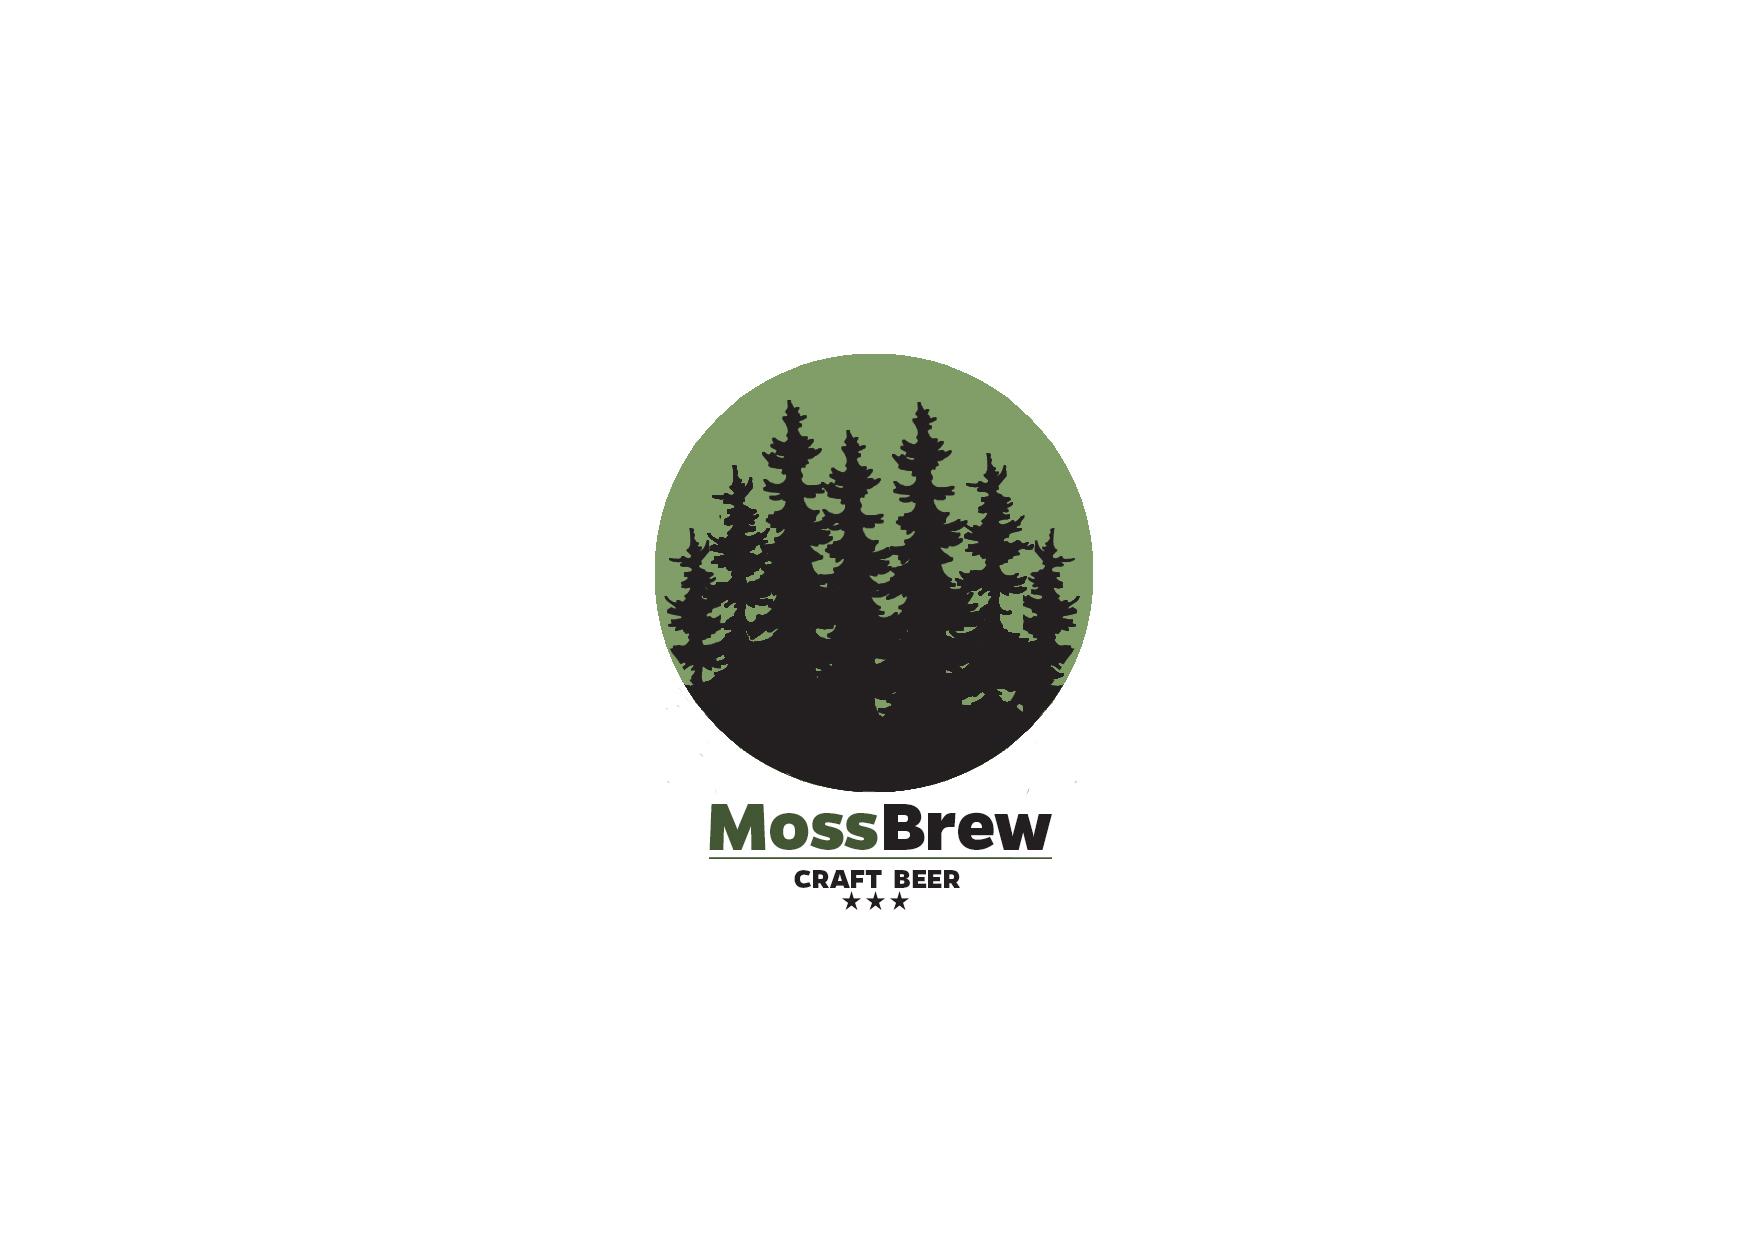 Логотип для пивоварни фото f_37559889a401a649.jpg